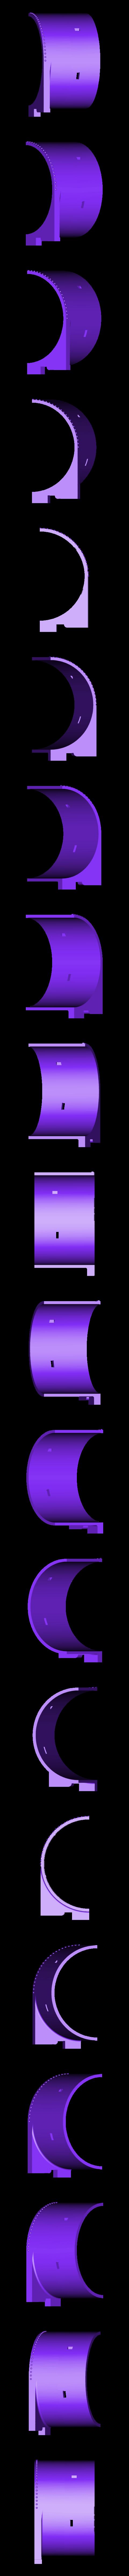 Boiler_Section_3-_SCALED_Part_3.STL Download free STL file 4-8-8-4 Big Boy Locomotive • 3D printer object, RaymondDeLuca